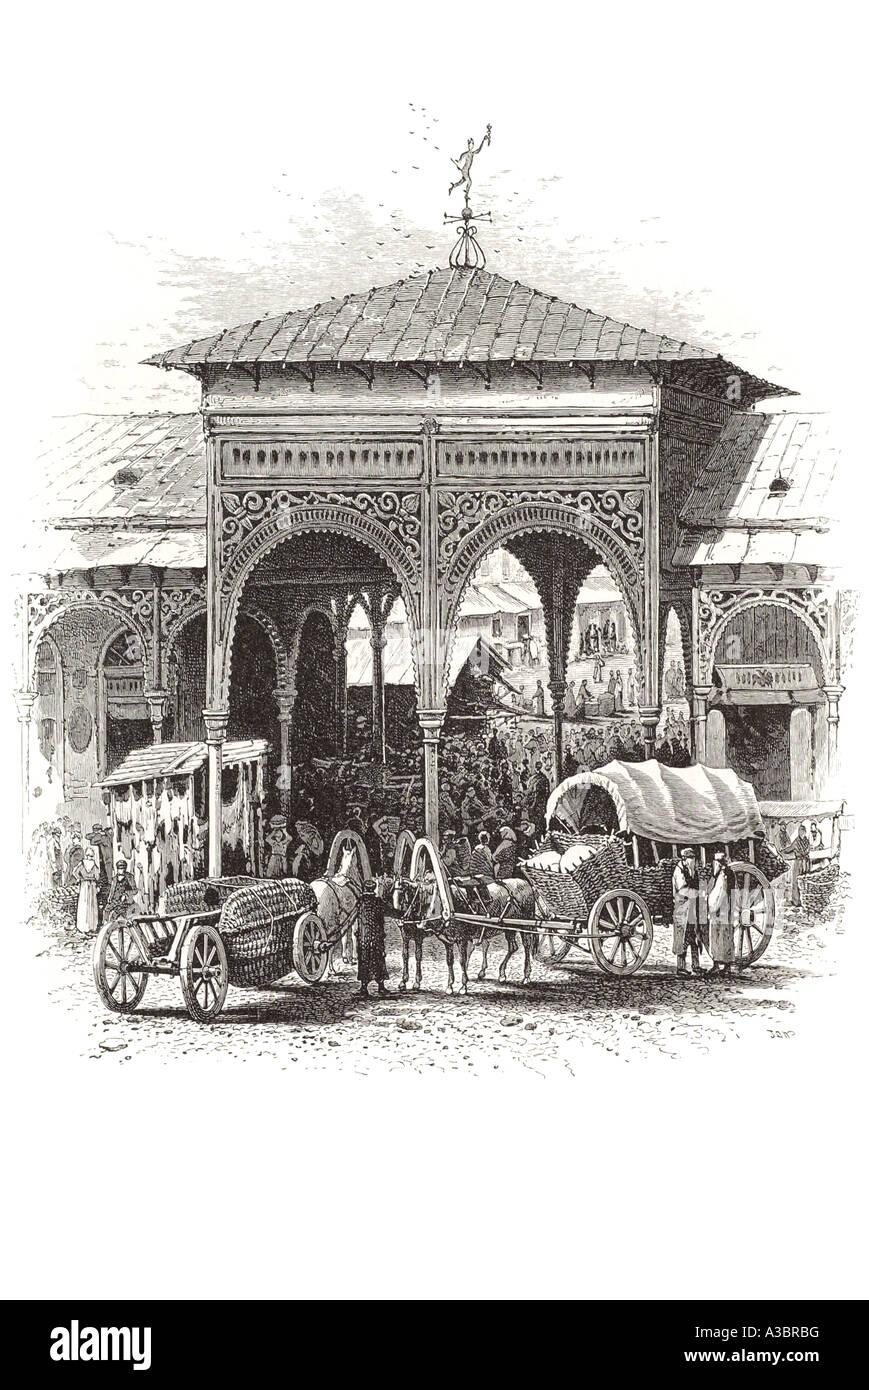 Jewish jew  trade bazaar horse cart wagon Poland Europe gateway ornate arch square wood wooden entrance polski Warszawa - Stock Image